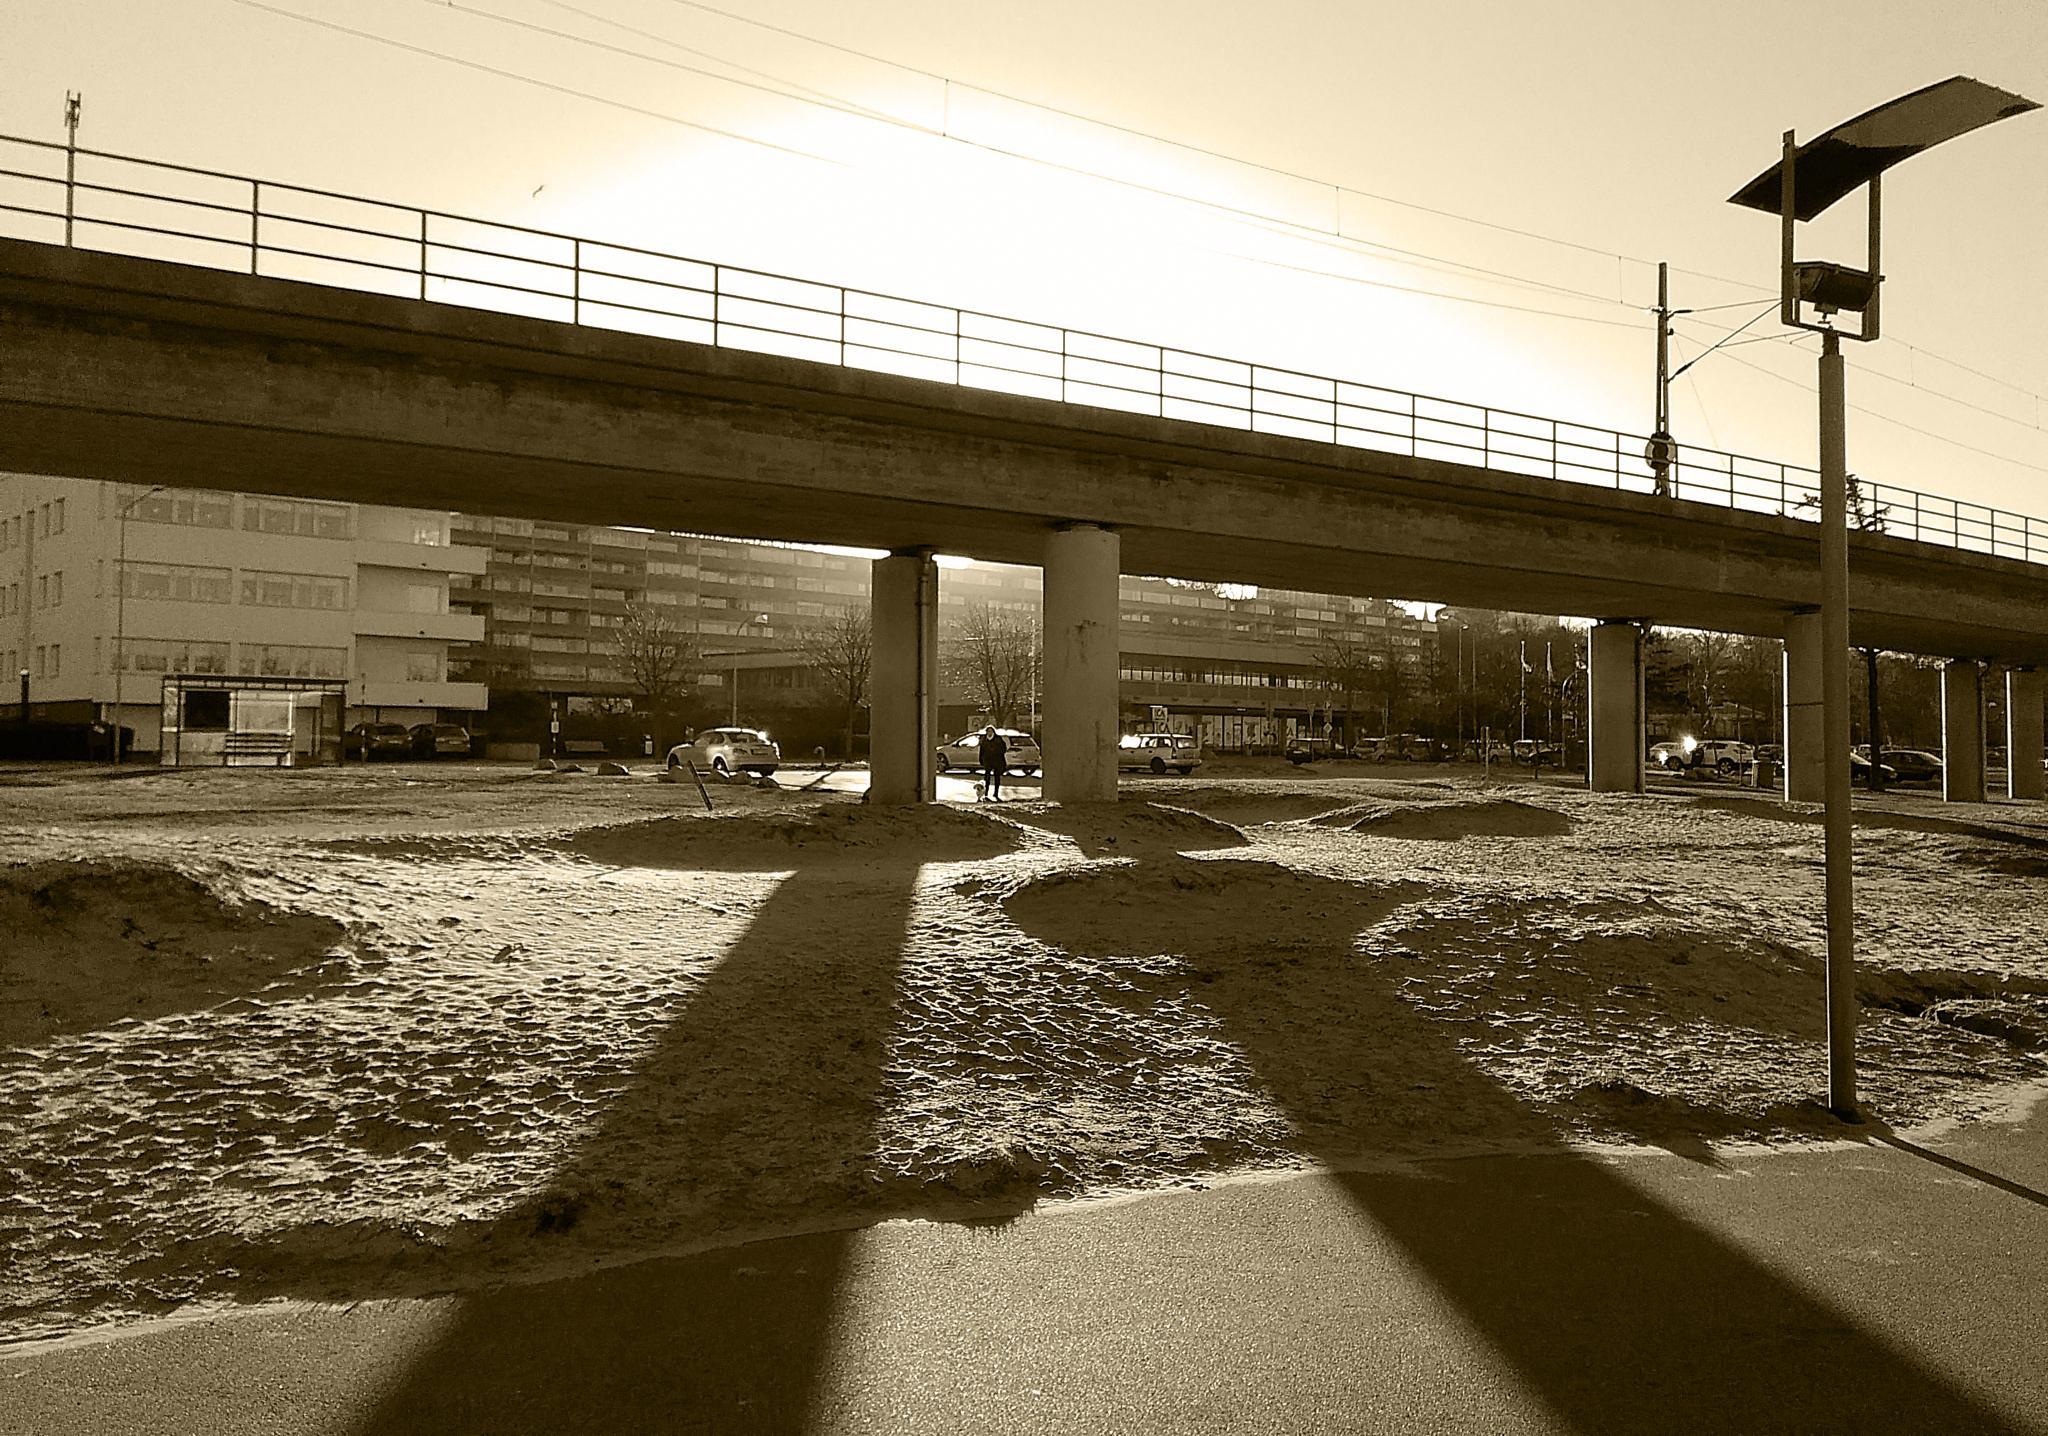 Morning Light by Freddy Olsson